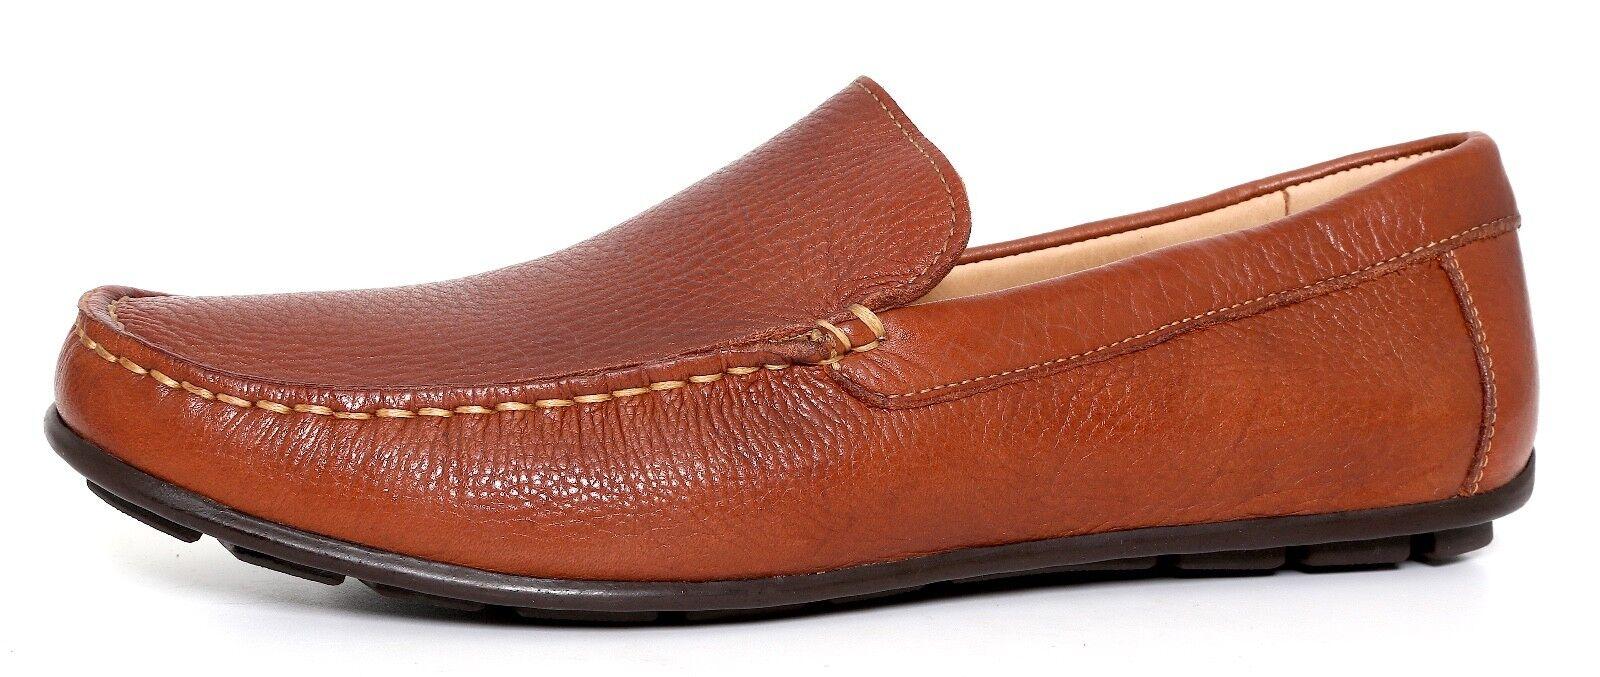 1901 Slip On Pelle Loafers Brown Sz 8 M 1260